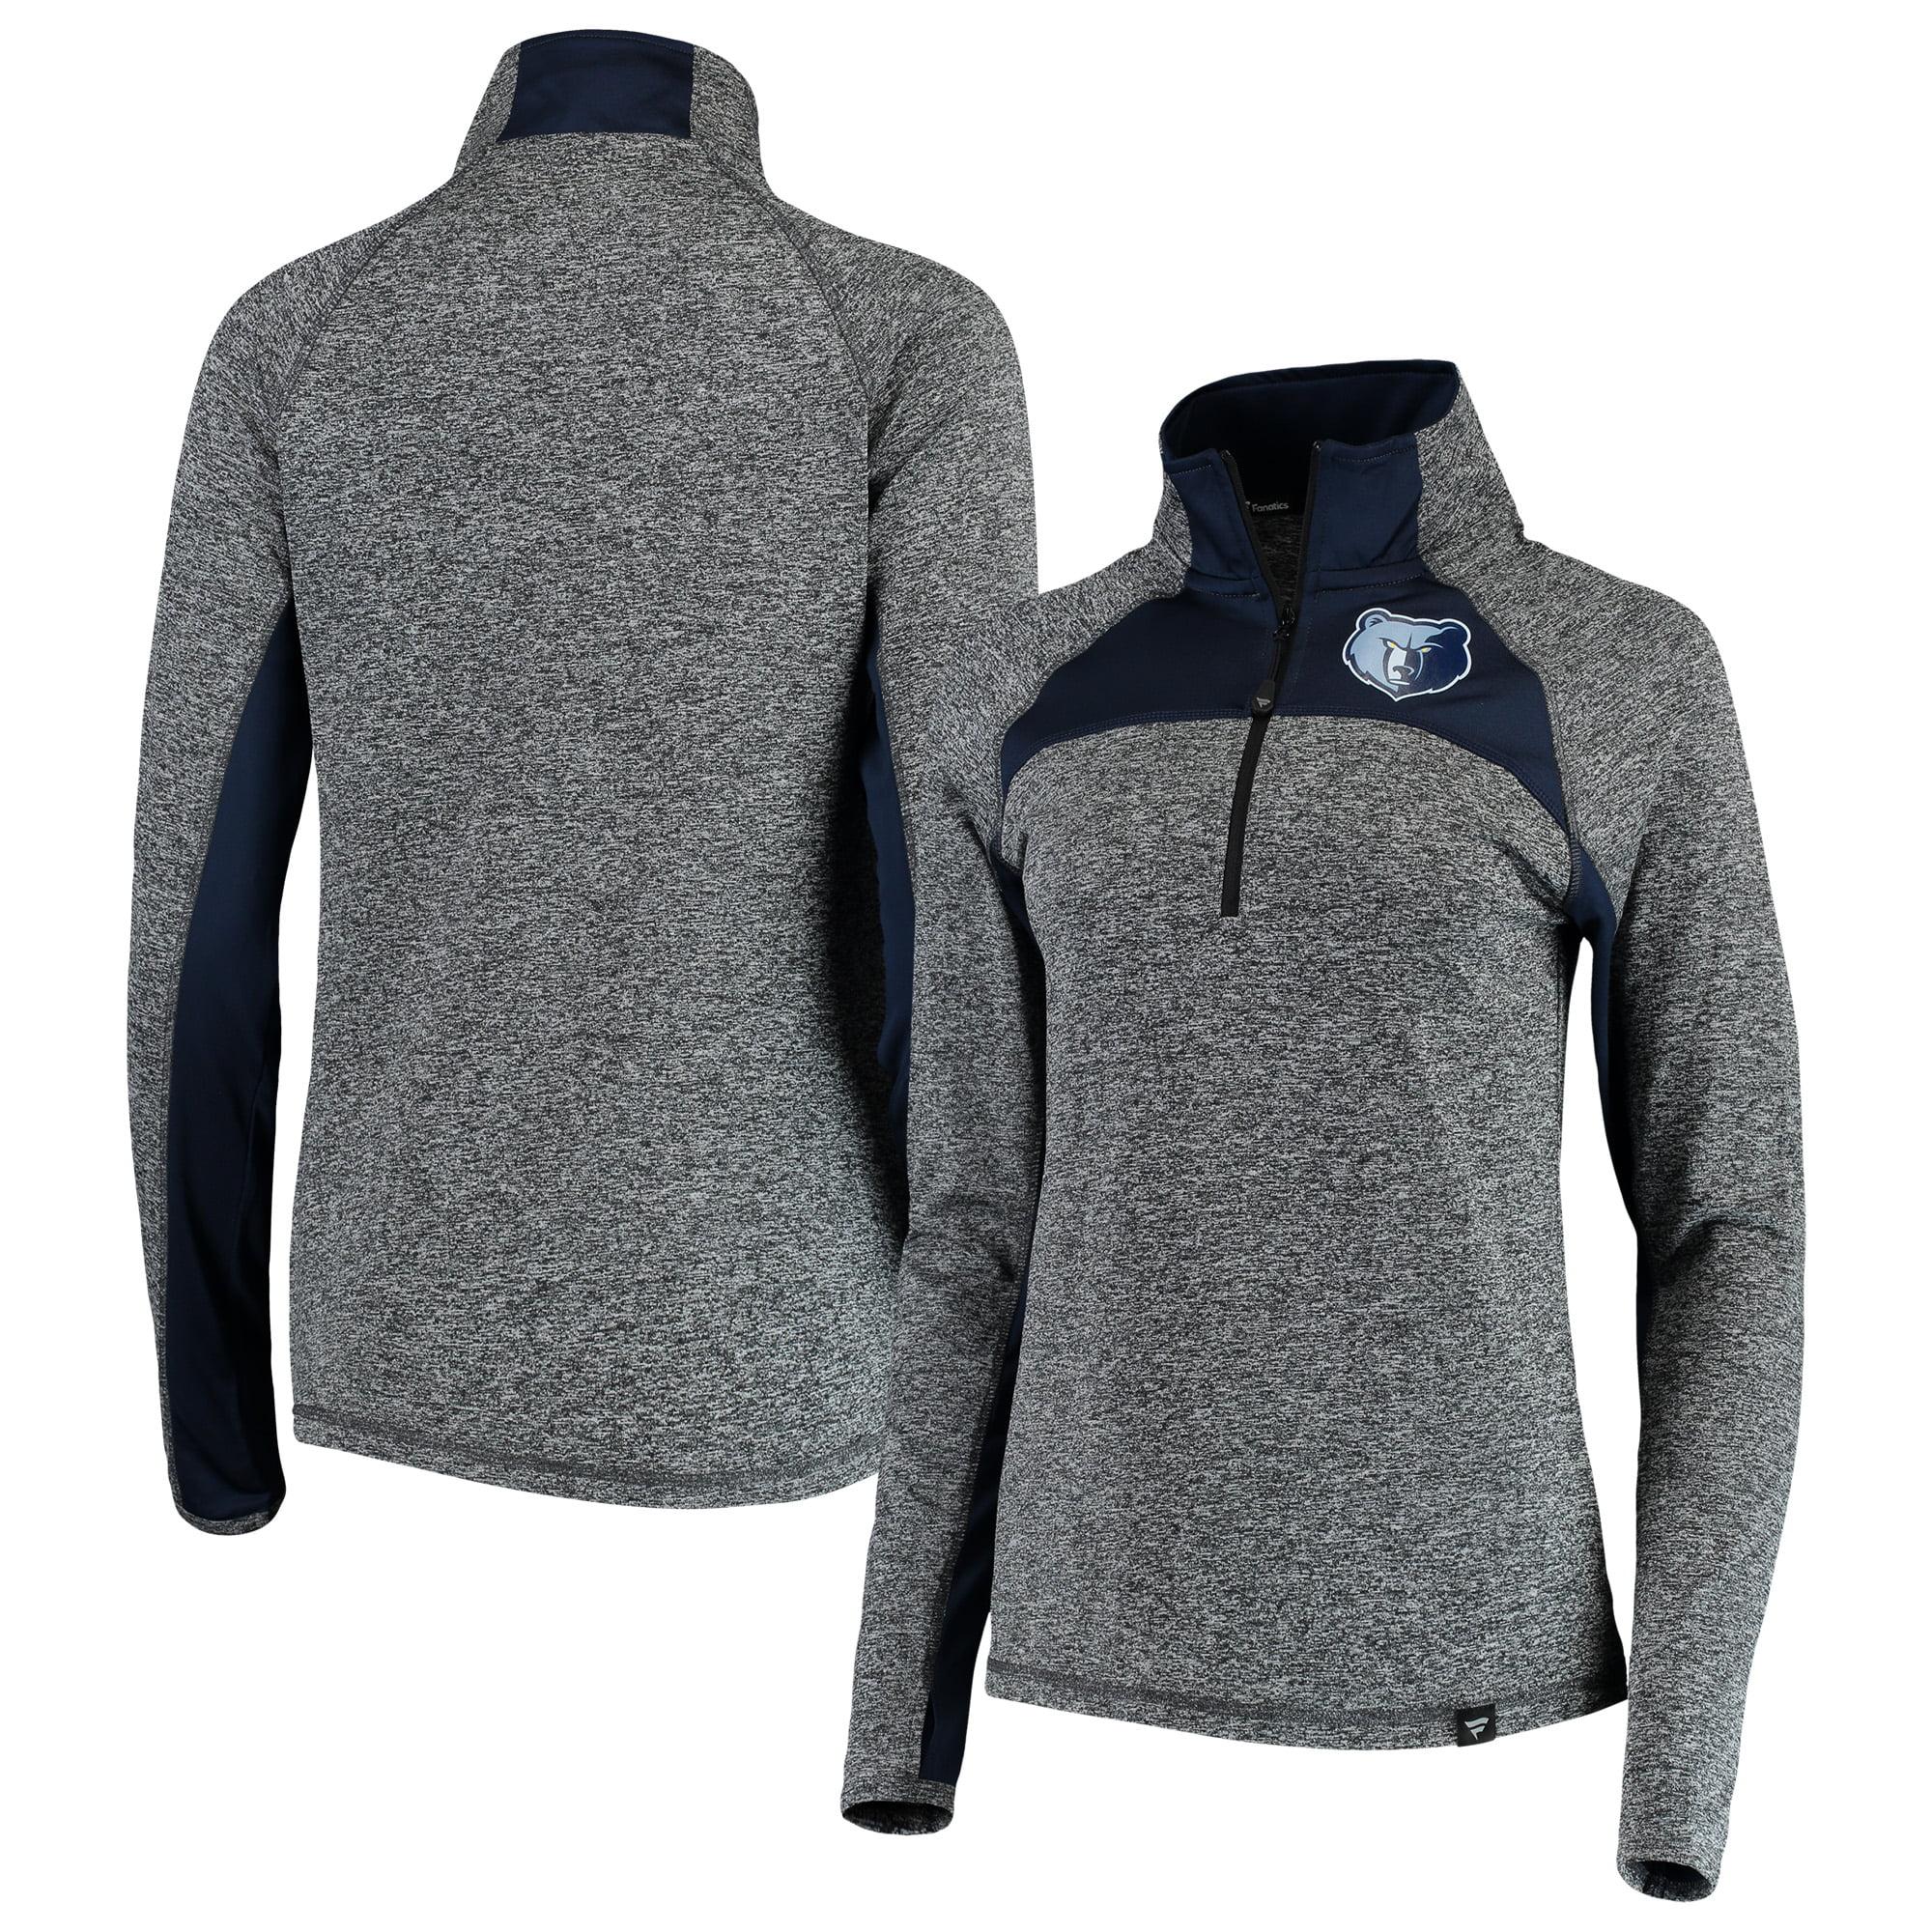 Memphis Grizzlies Fanatics Branded Women's Static Quarter-Zip Pullover Jacket - Heathered Gray